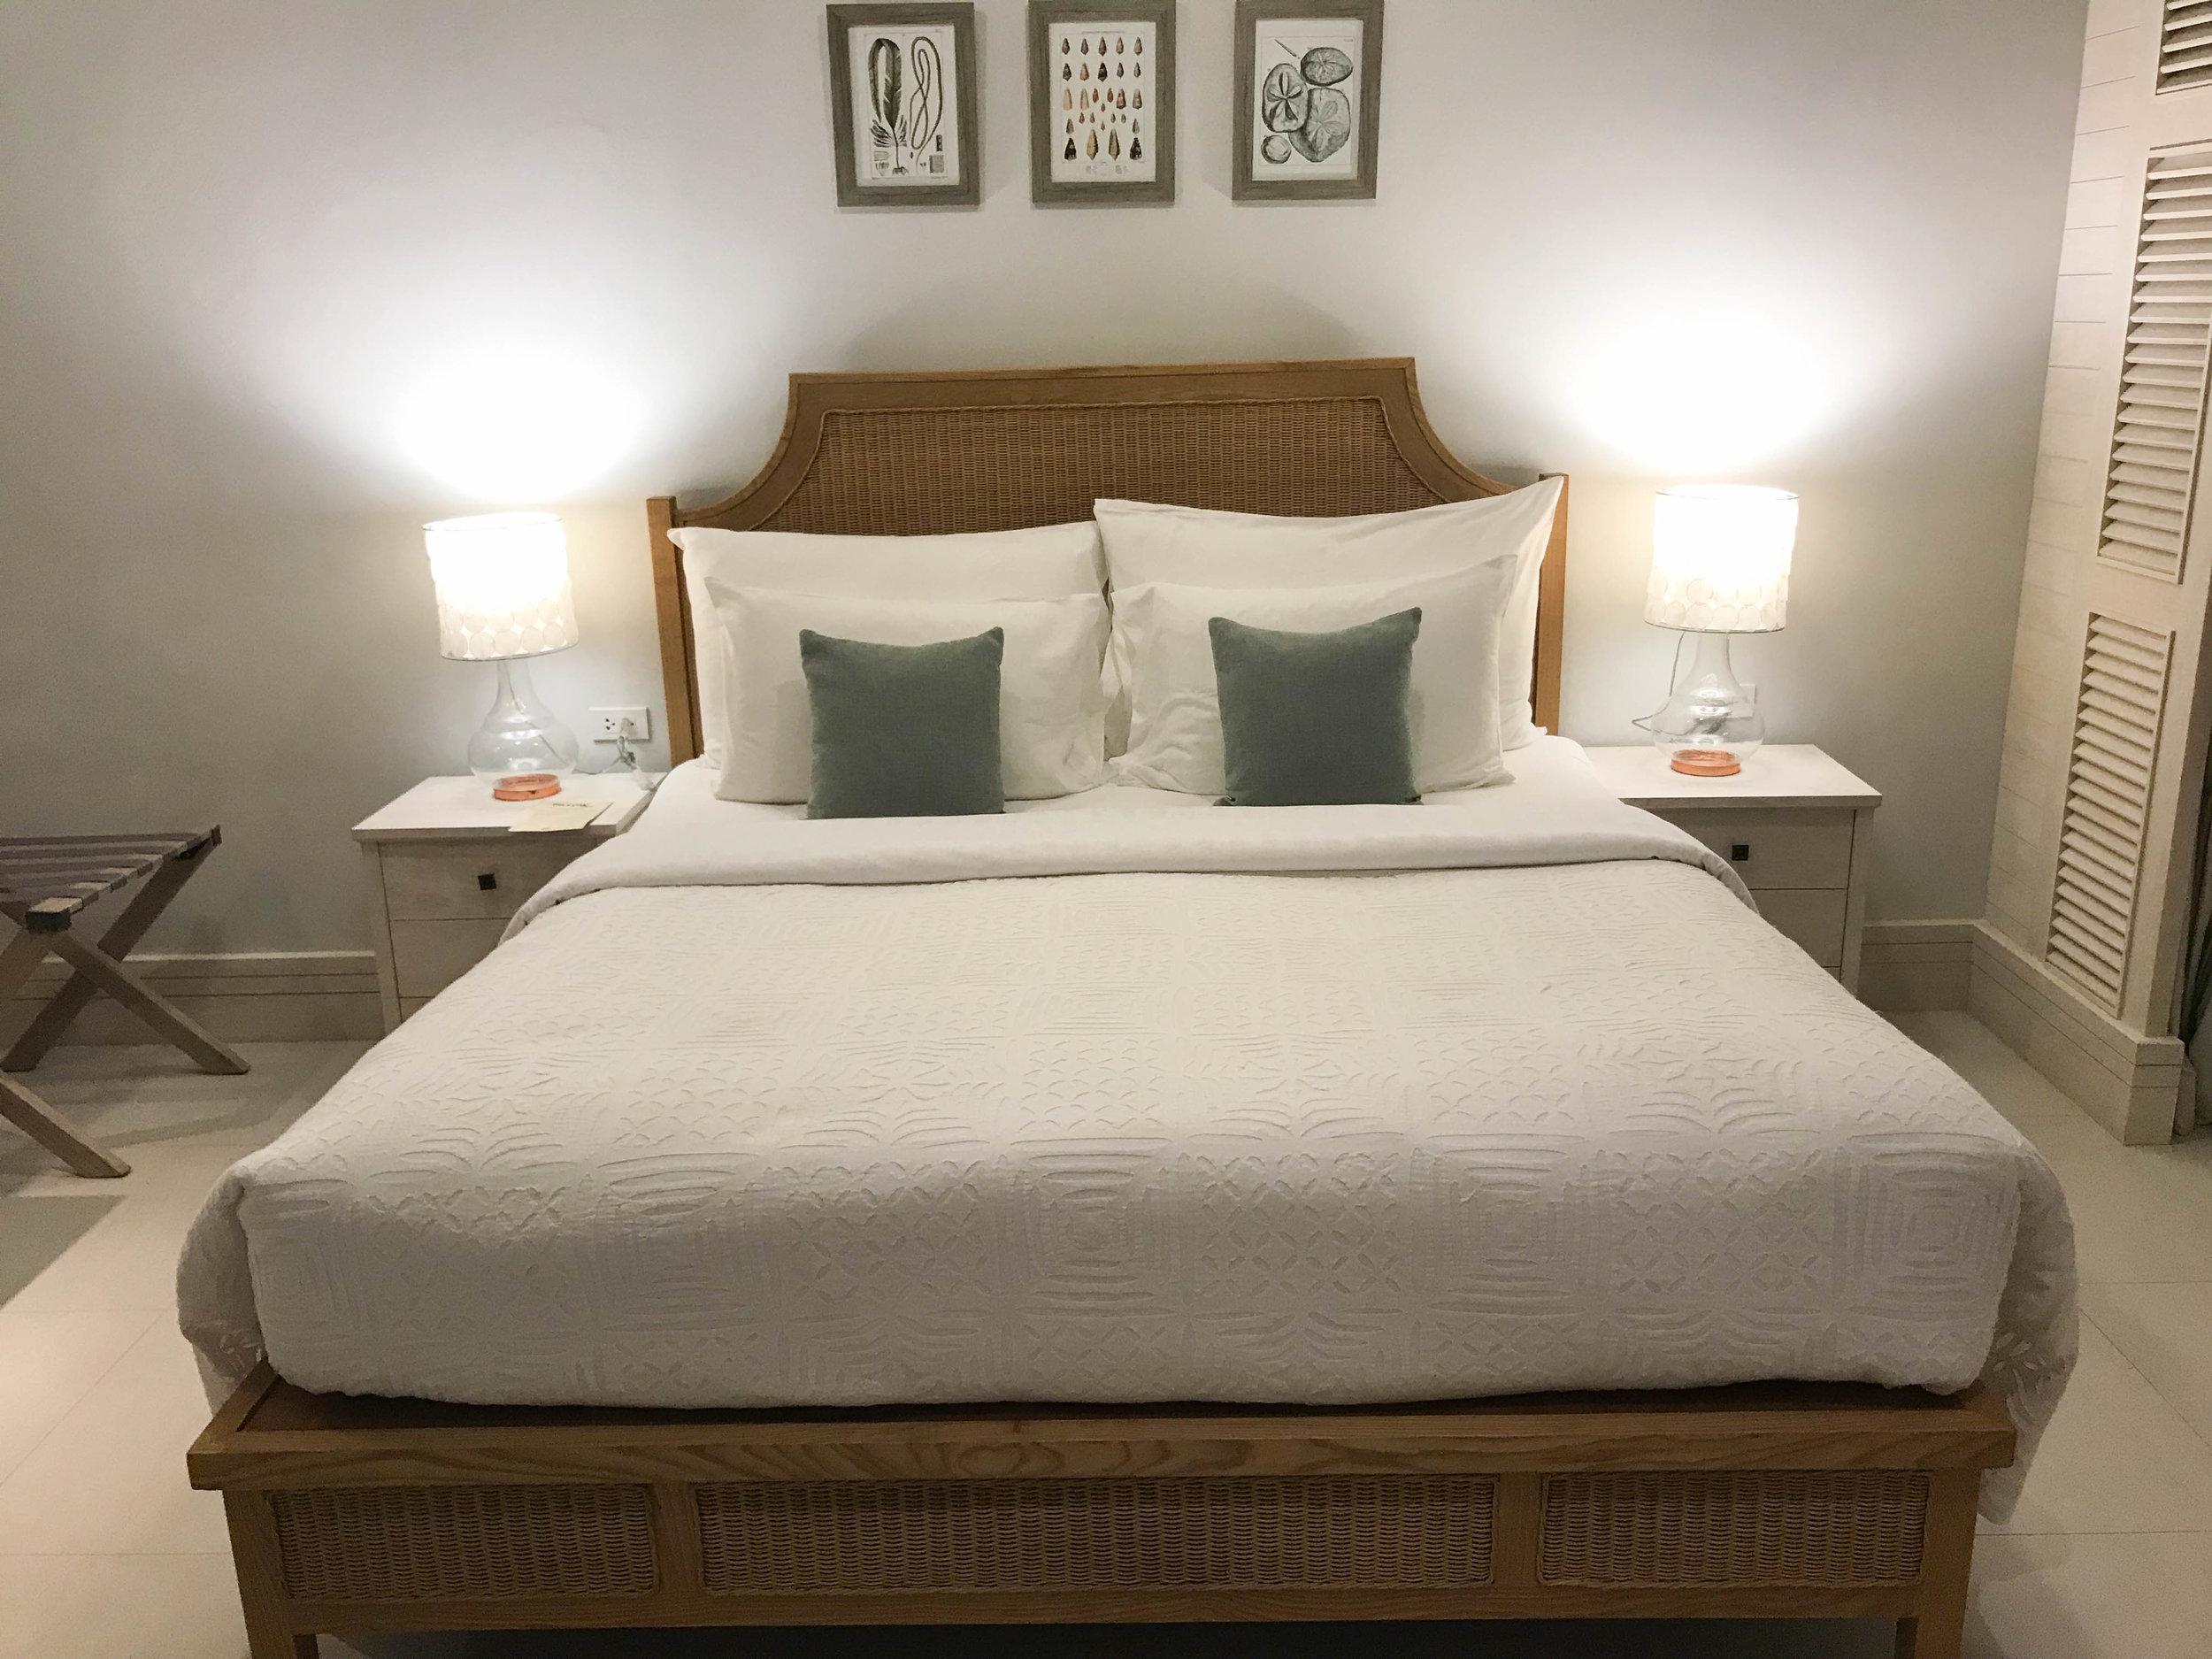 Thailand Cape Kudu Hotel Koh Yao Noi - Comfy bed